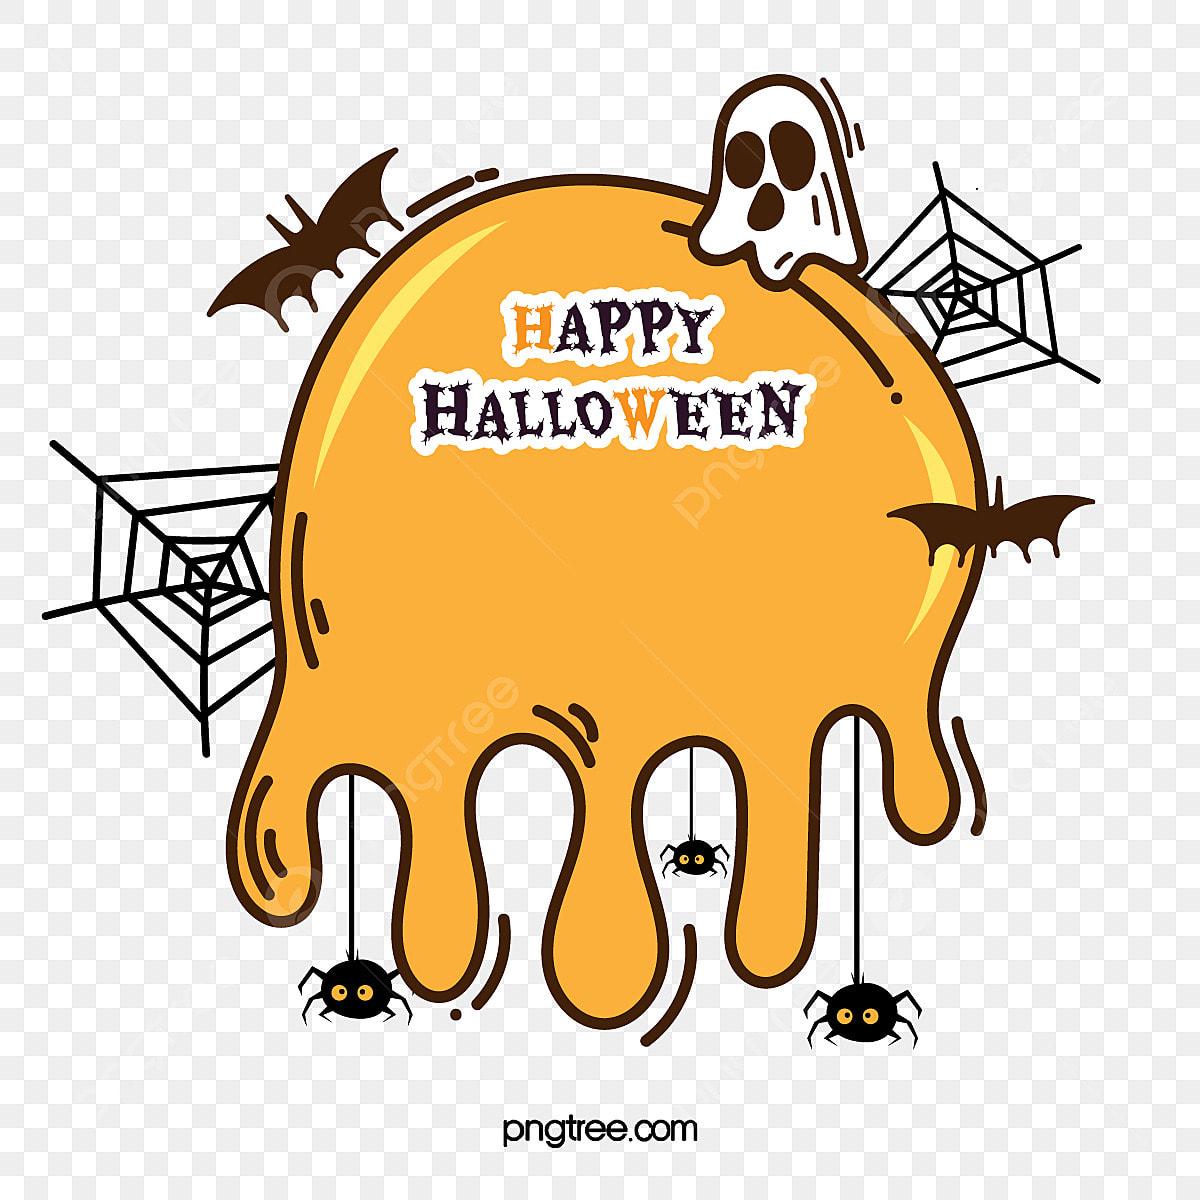 Bordure D Halloween De Dessin Anime De Couleur Citrouille Carton